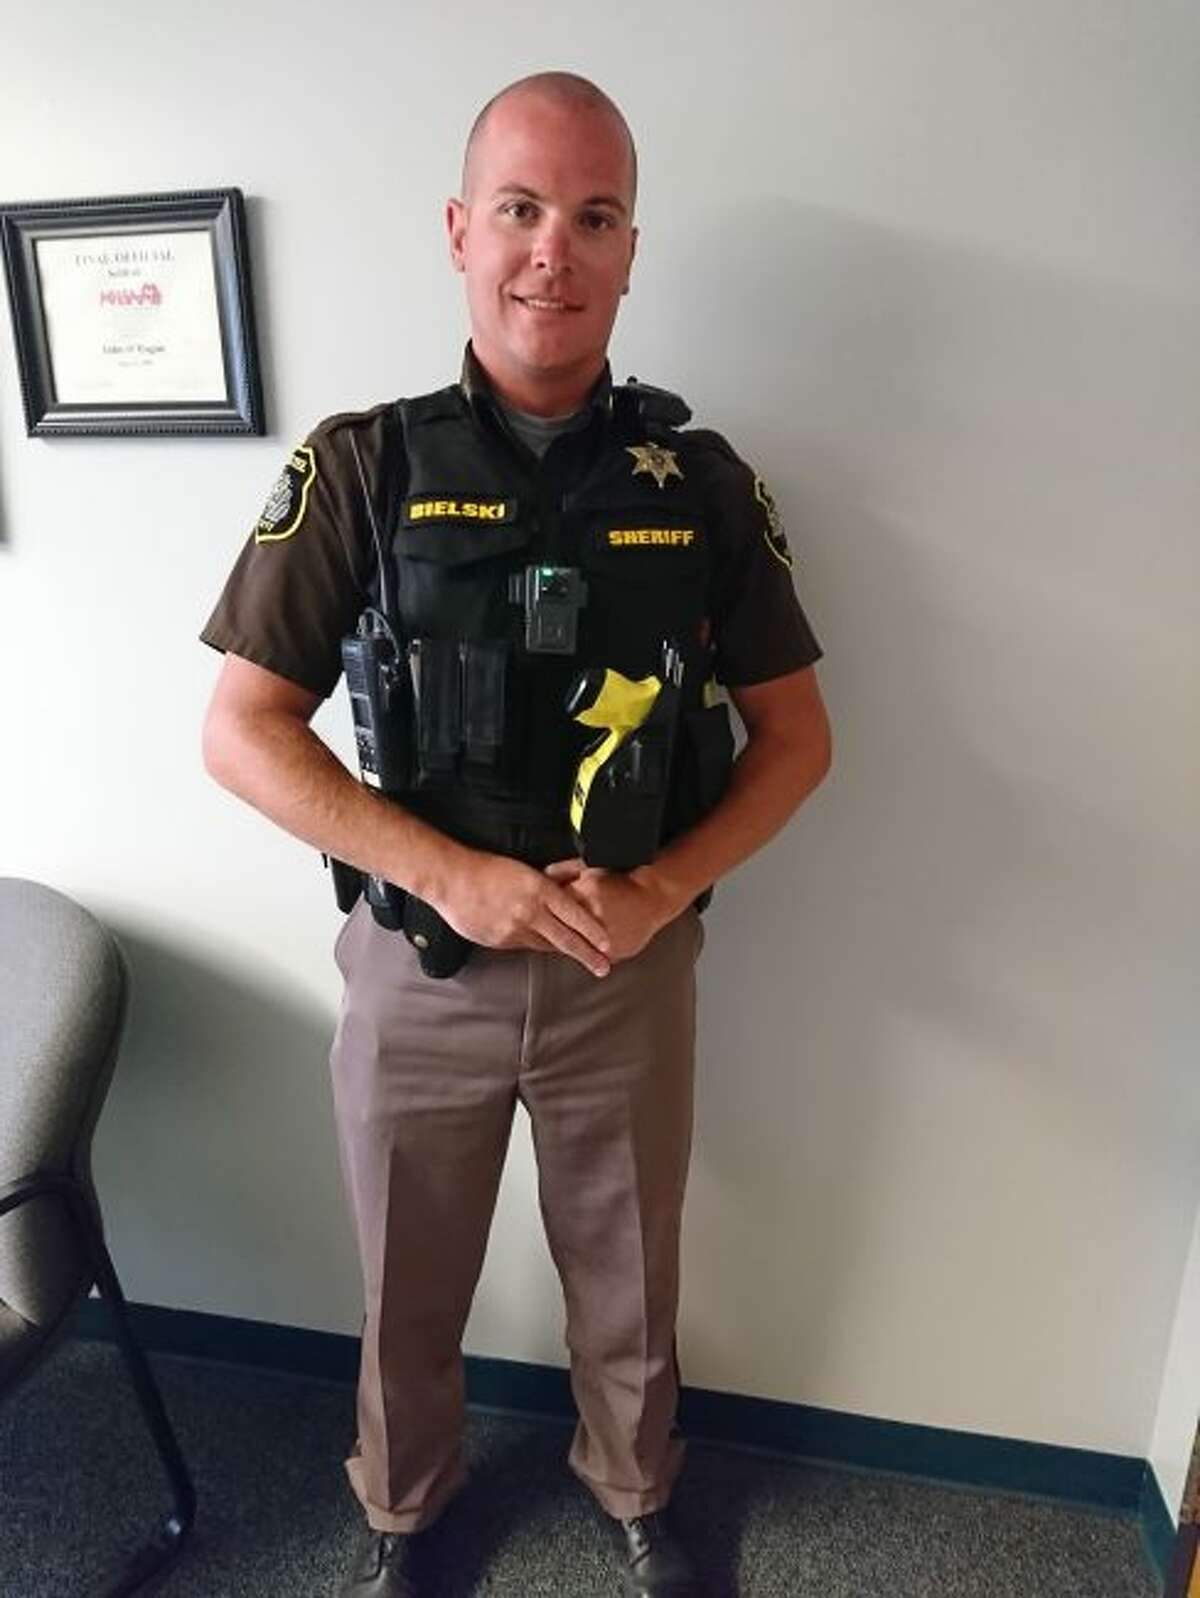 Deputy sheriff Jake Bielski wears his new load-bearing vest that is full equipped with gear. The new vests replace the old bulletproof vest and duty belt combination. (Ashlyn Korienek/News Advocate)